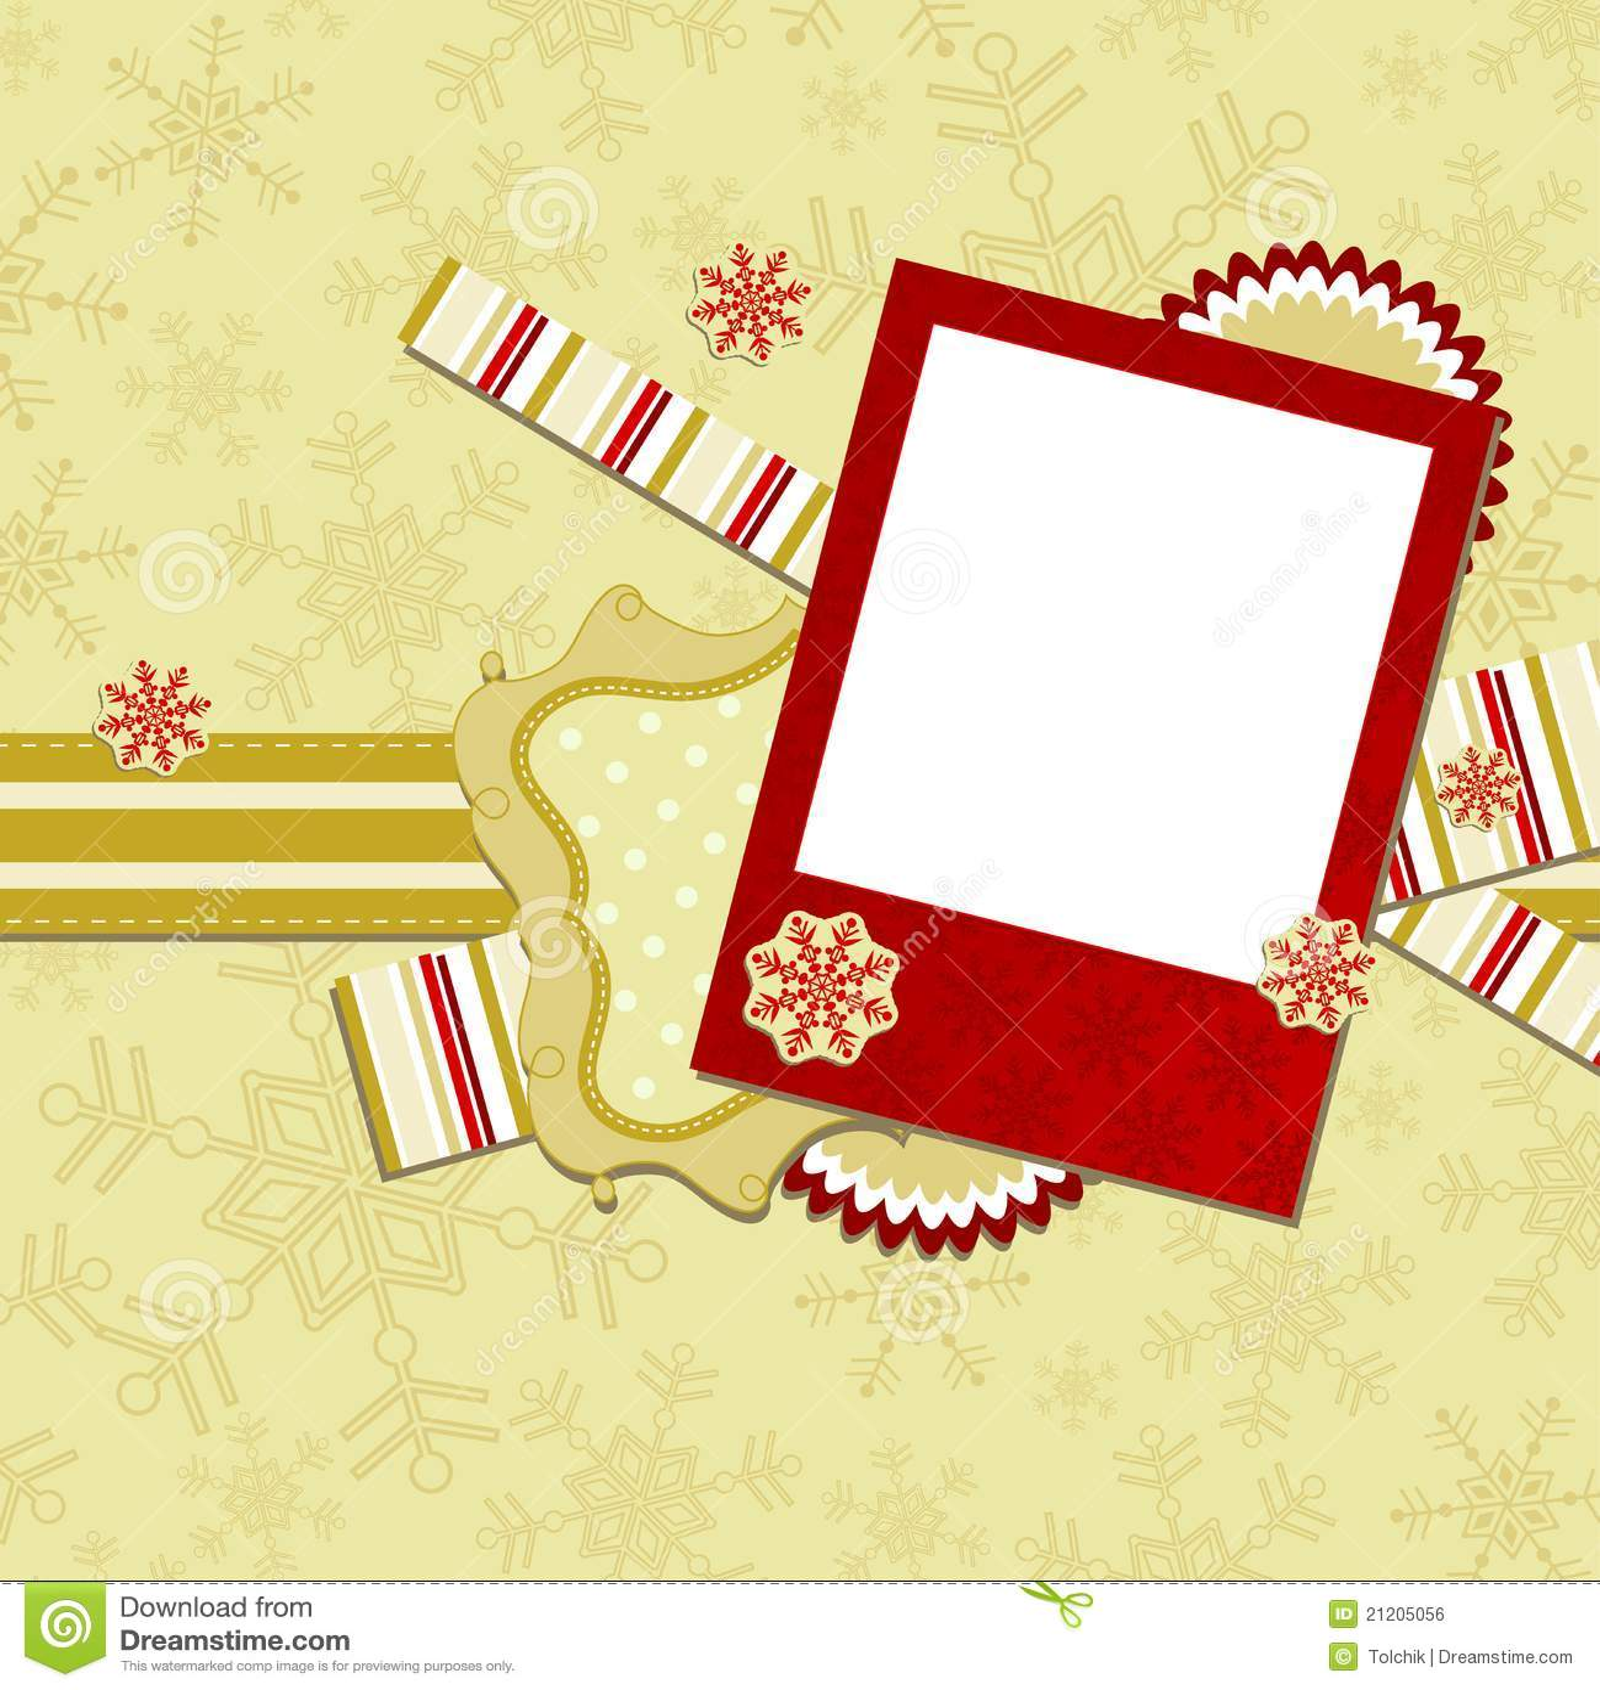 Template Christmas Greeting Card Royalty Free Stock Image   Image MmIRkqbT